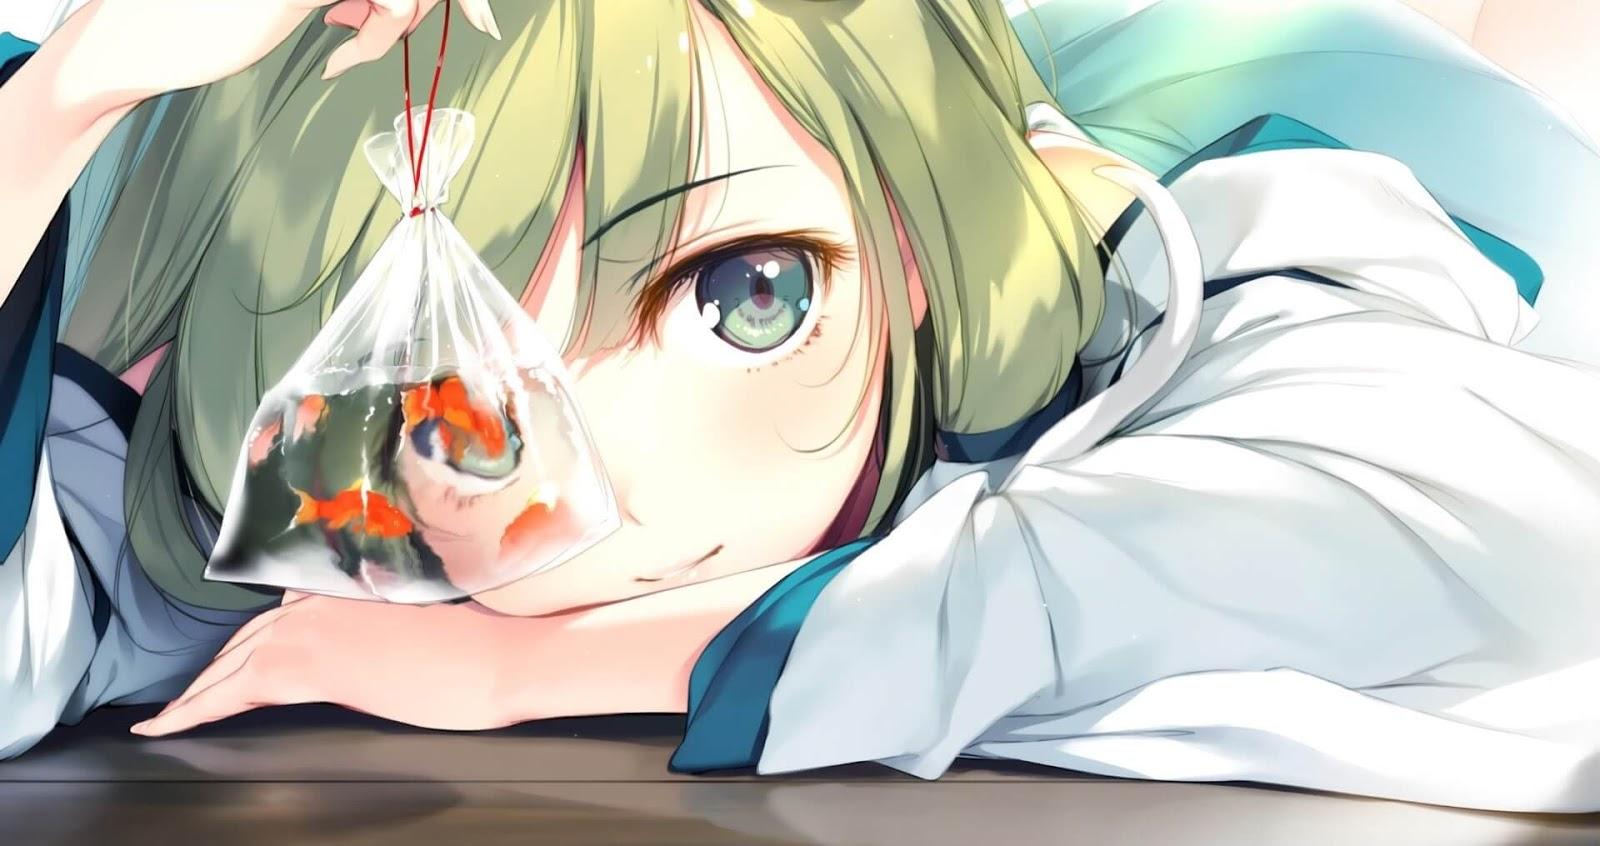 Kochiya Sanae 2 Touhou Project [Wallpaper Engine Anime]